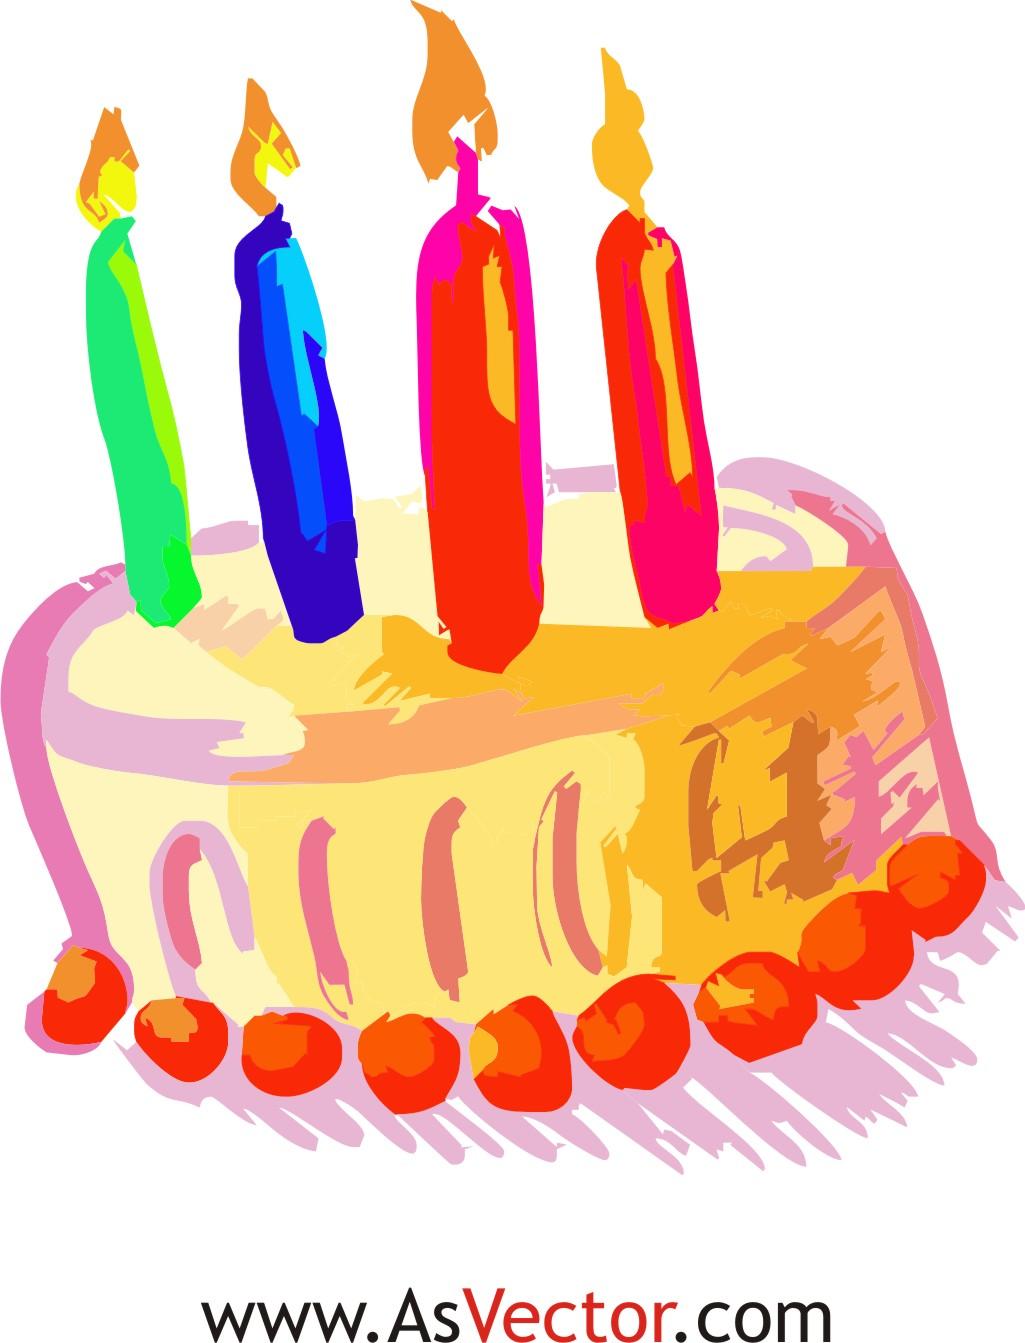 February birthday clipart vector royalty free library February Birthday Clipart - Clipart Kid vector royalty free library